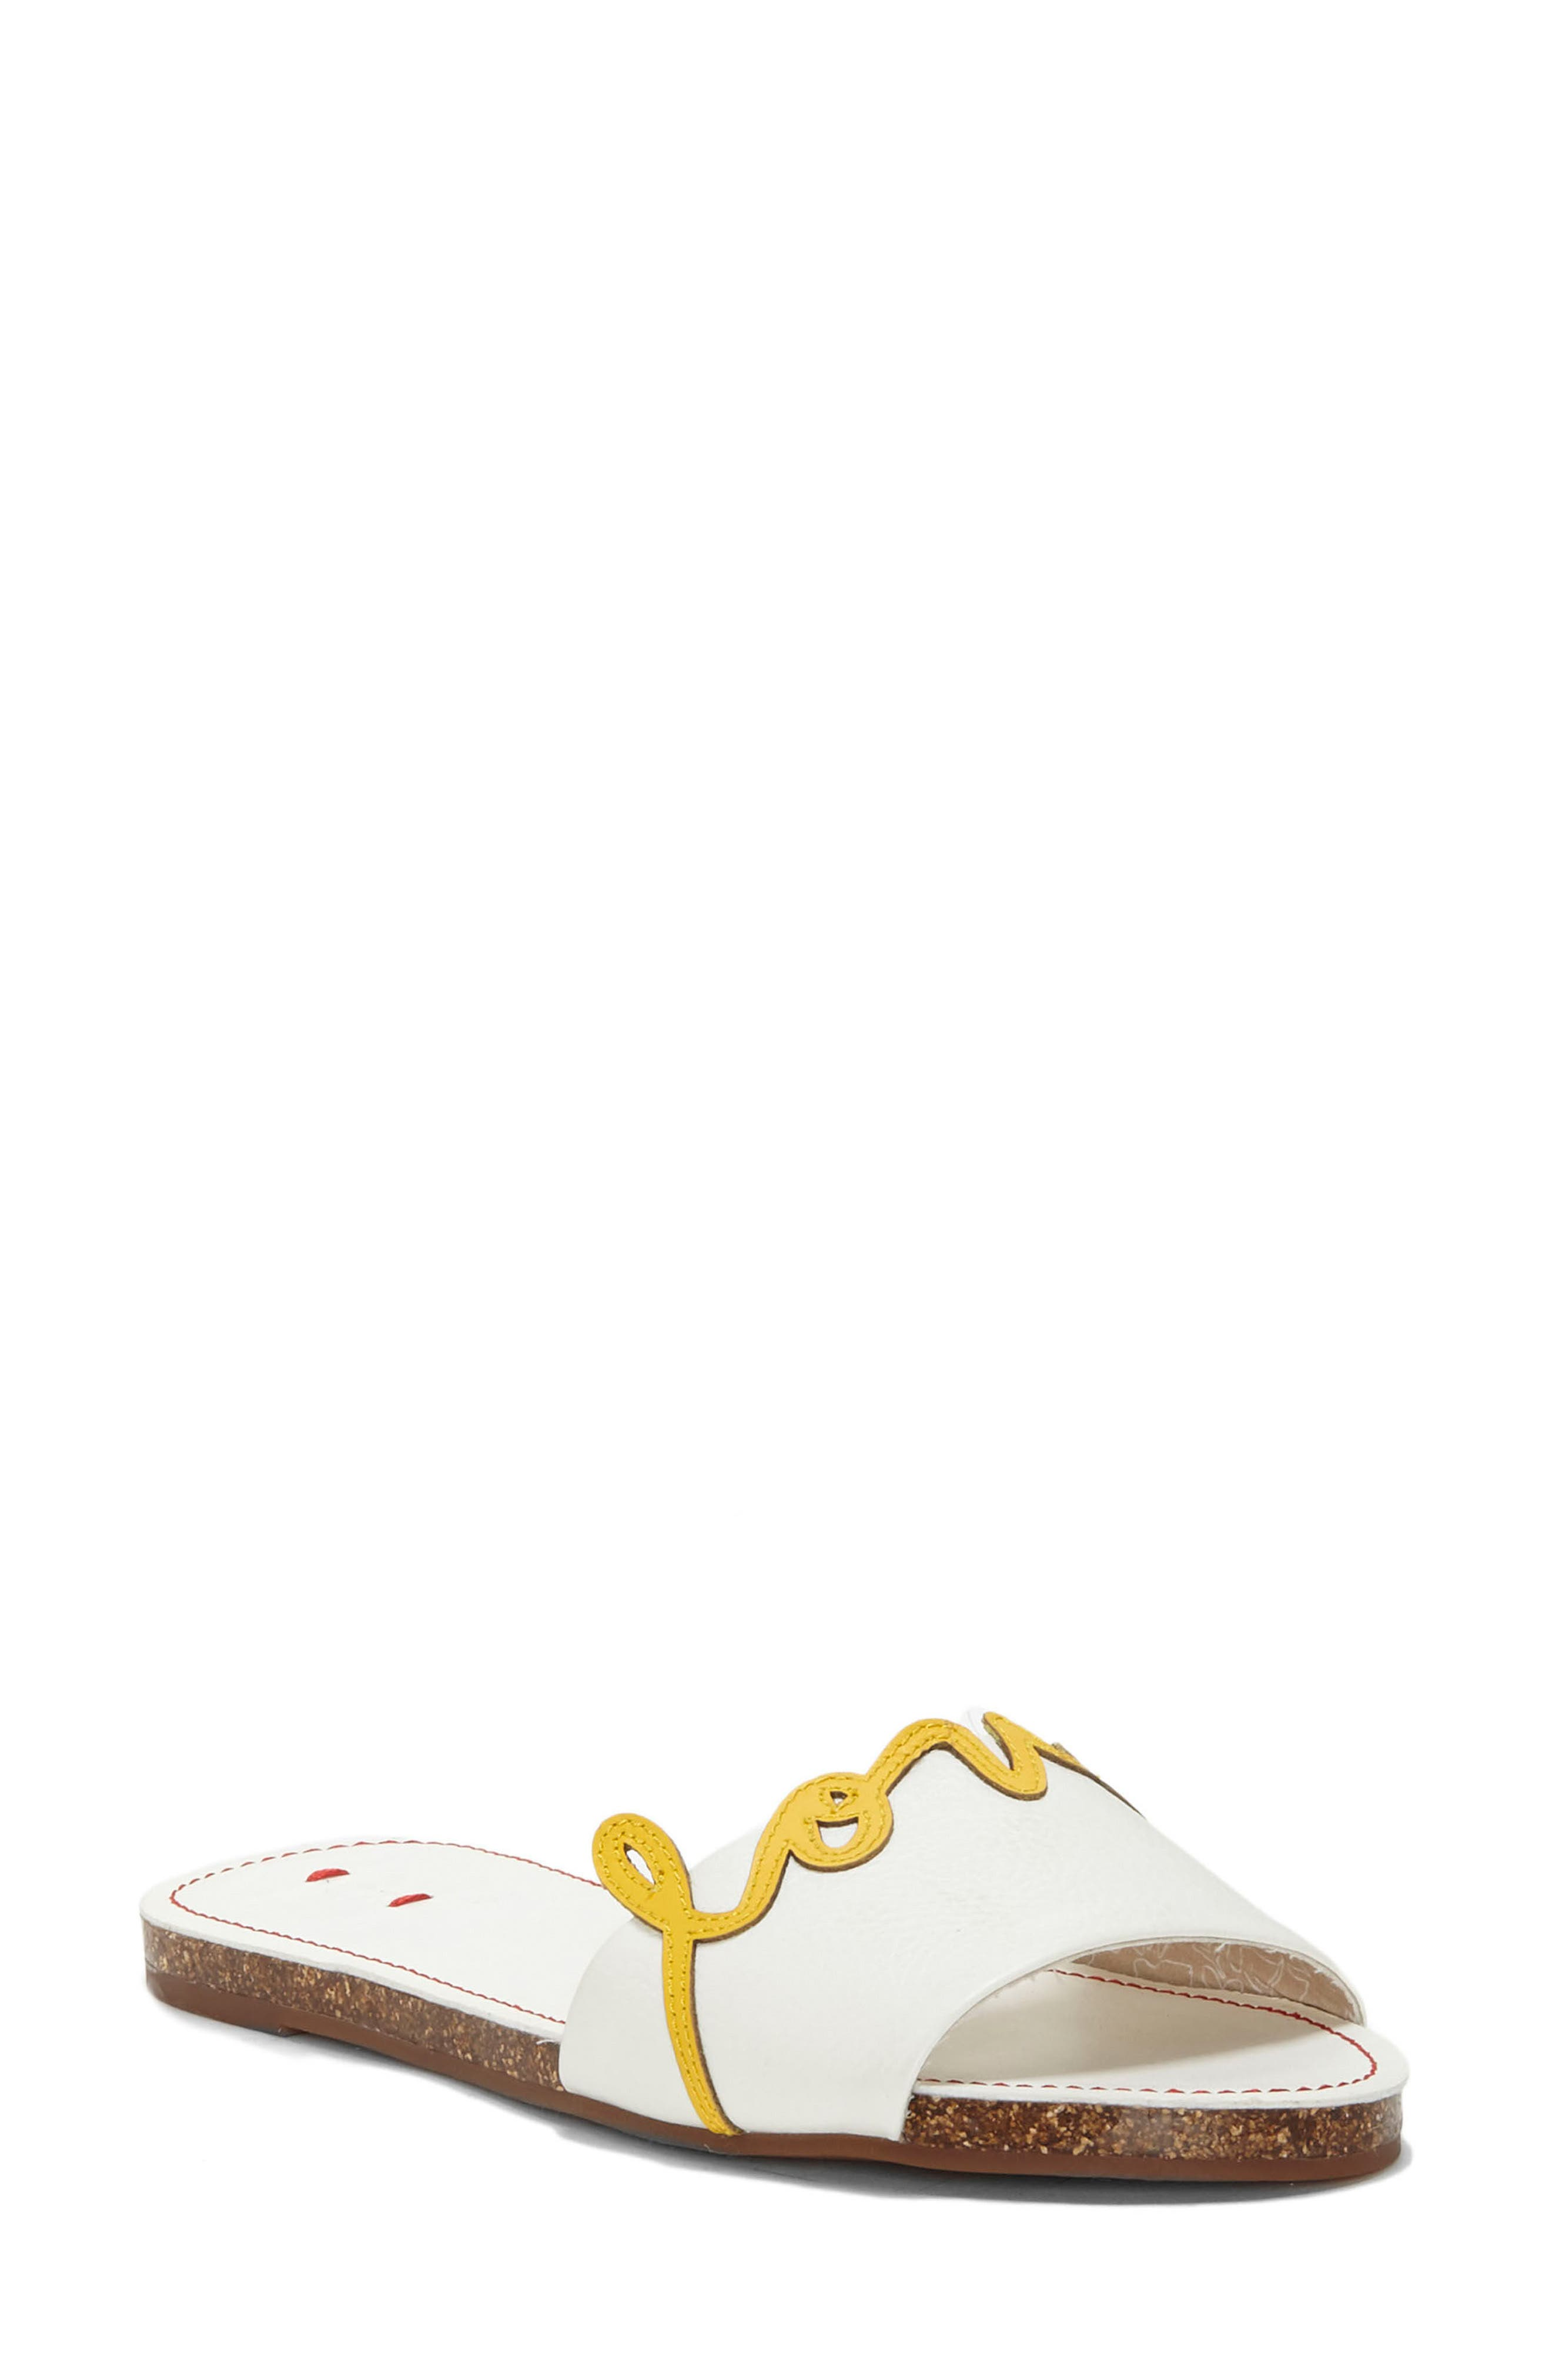 Sharlin Slide Sandal,                         Main,                         color, 110